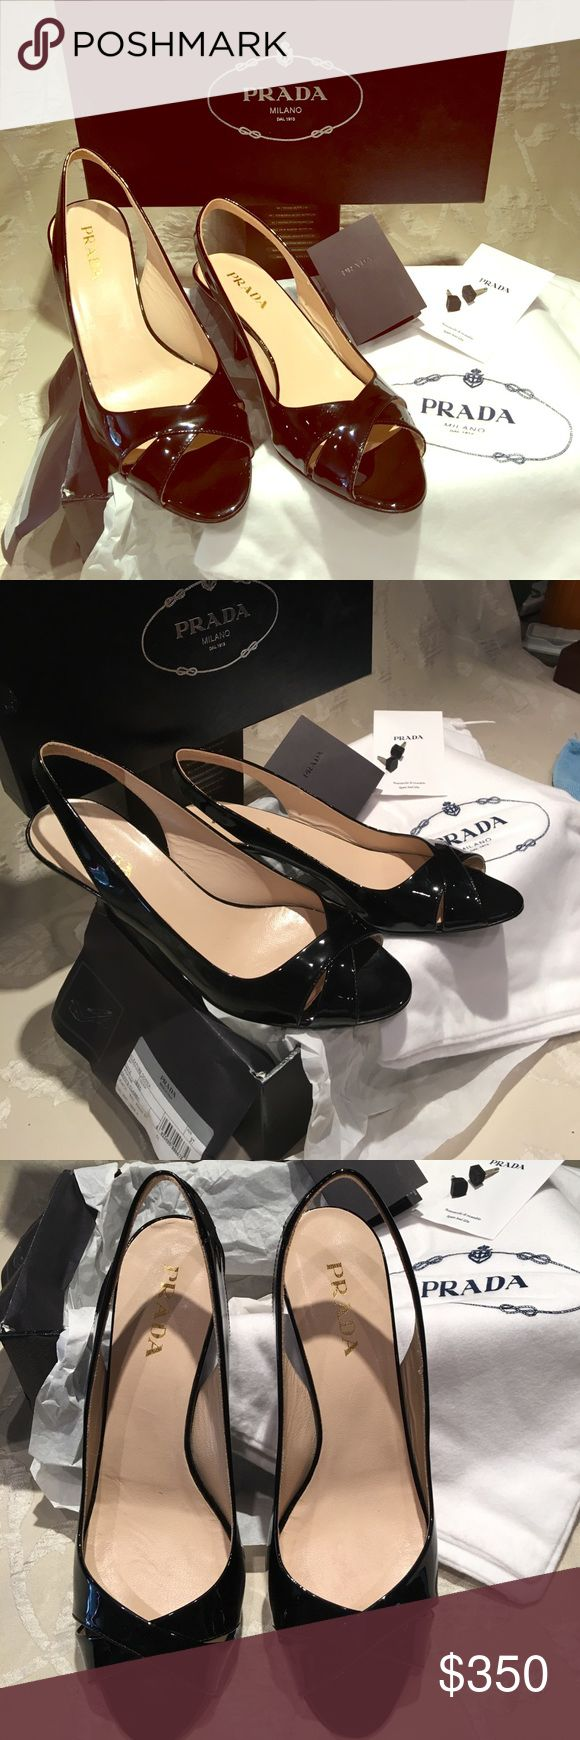 prada black patent classic slingback heels like brand new worn once for a few hours